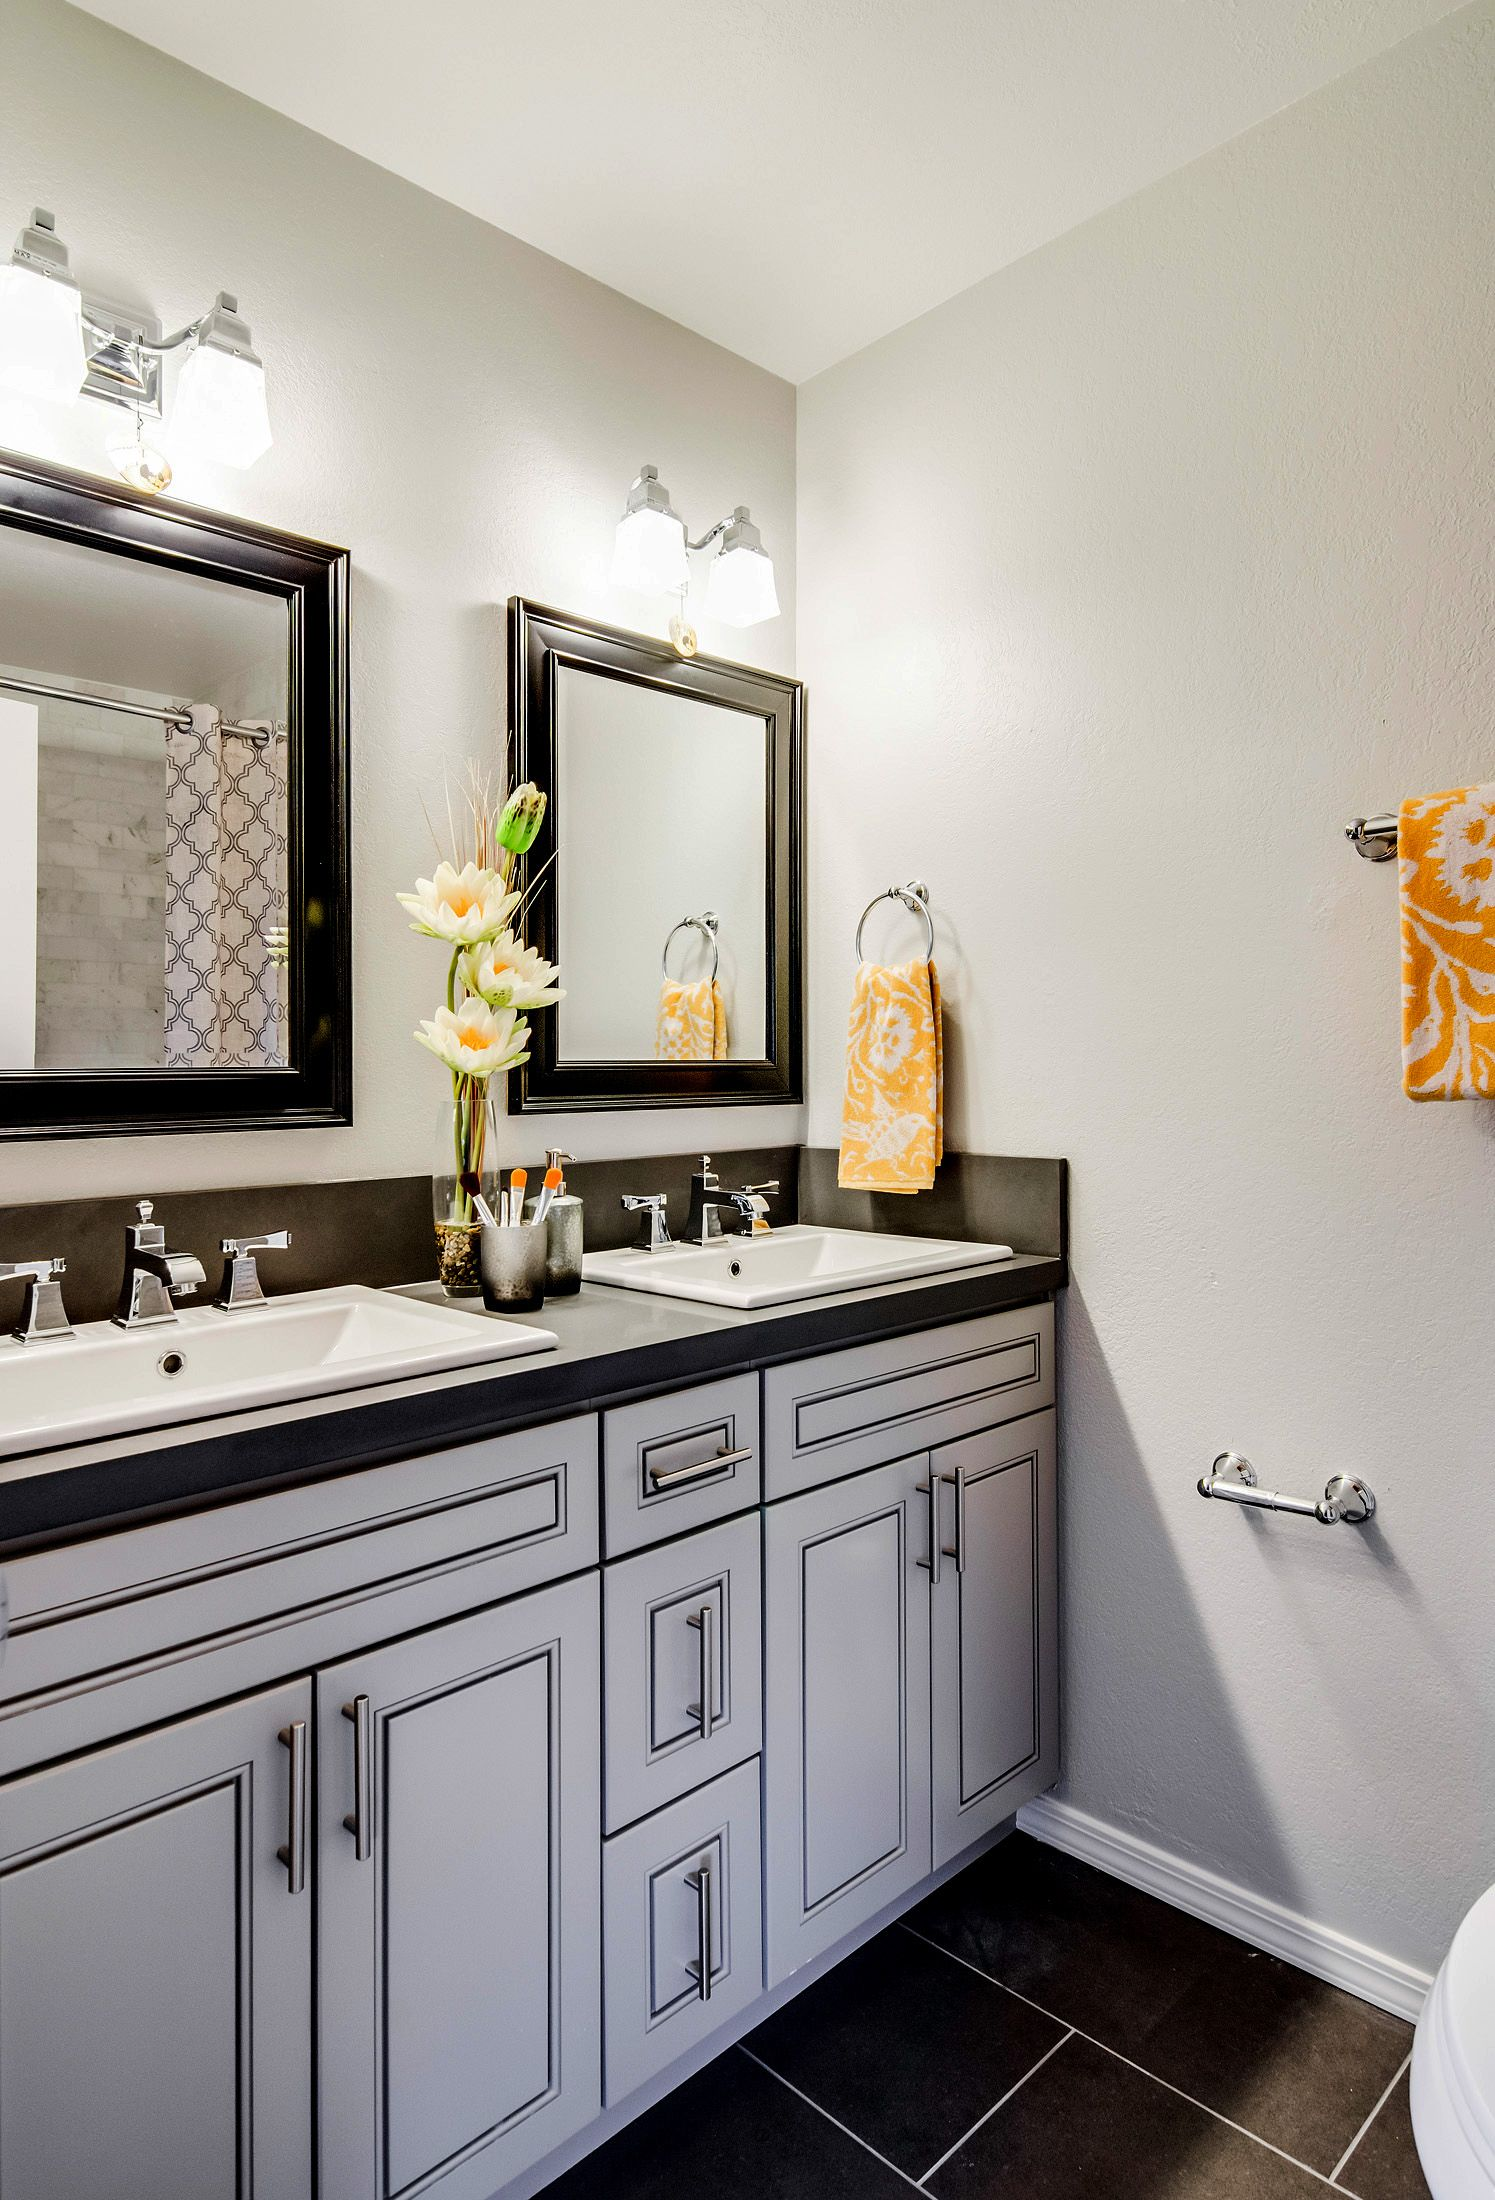 Greige Maple Cabinet Discount Kitchen Cabinets Kitchen Cabinets In Bathroom Bathroom Decor